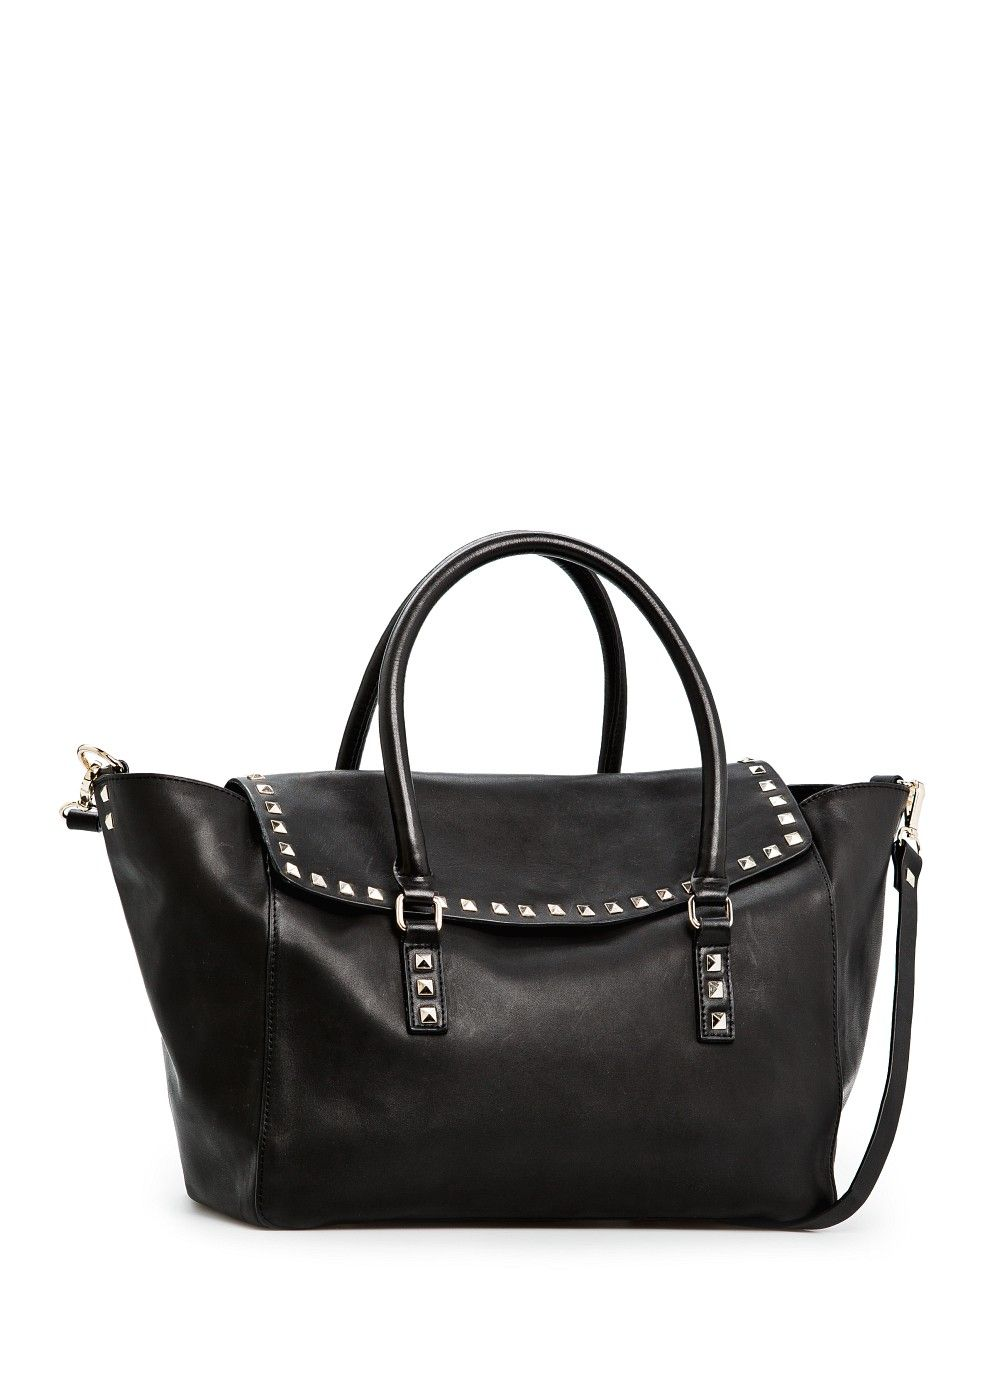 MANGO - BAGS - Studded leather shopper bag, $229